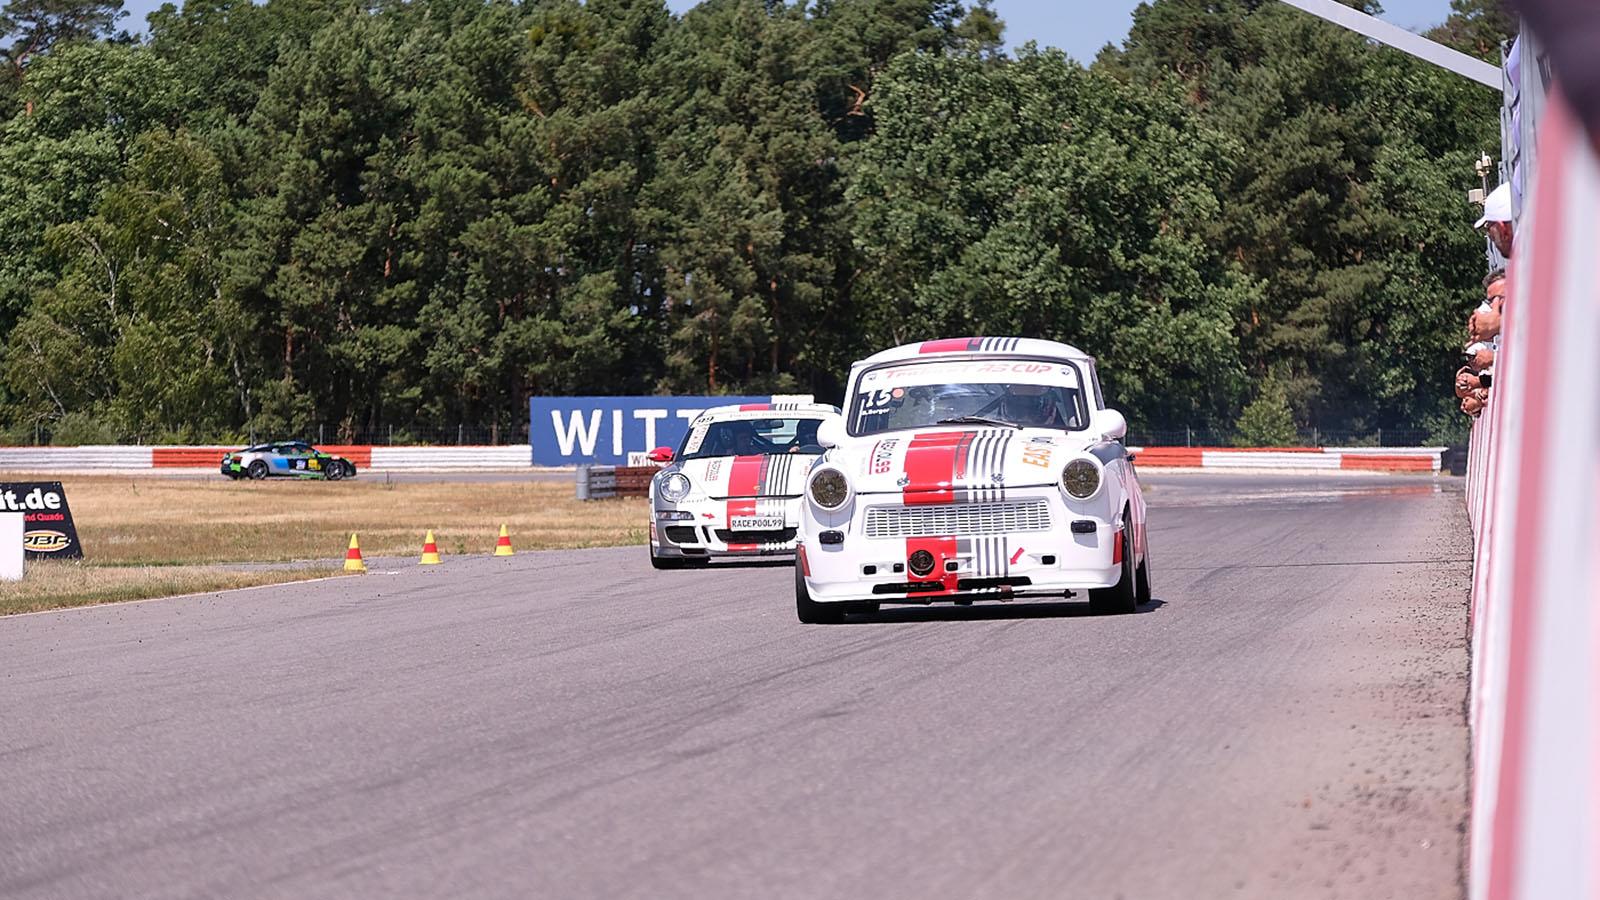 race trabant 601 renntaxi auf dem lausitzring erlebnisfabrik. Black Bedroom Furniture Sets. Home Design Ideas